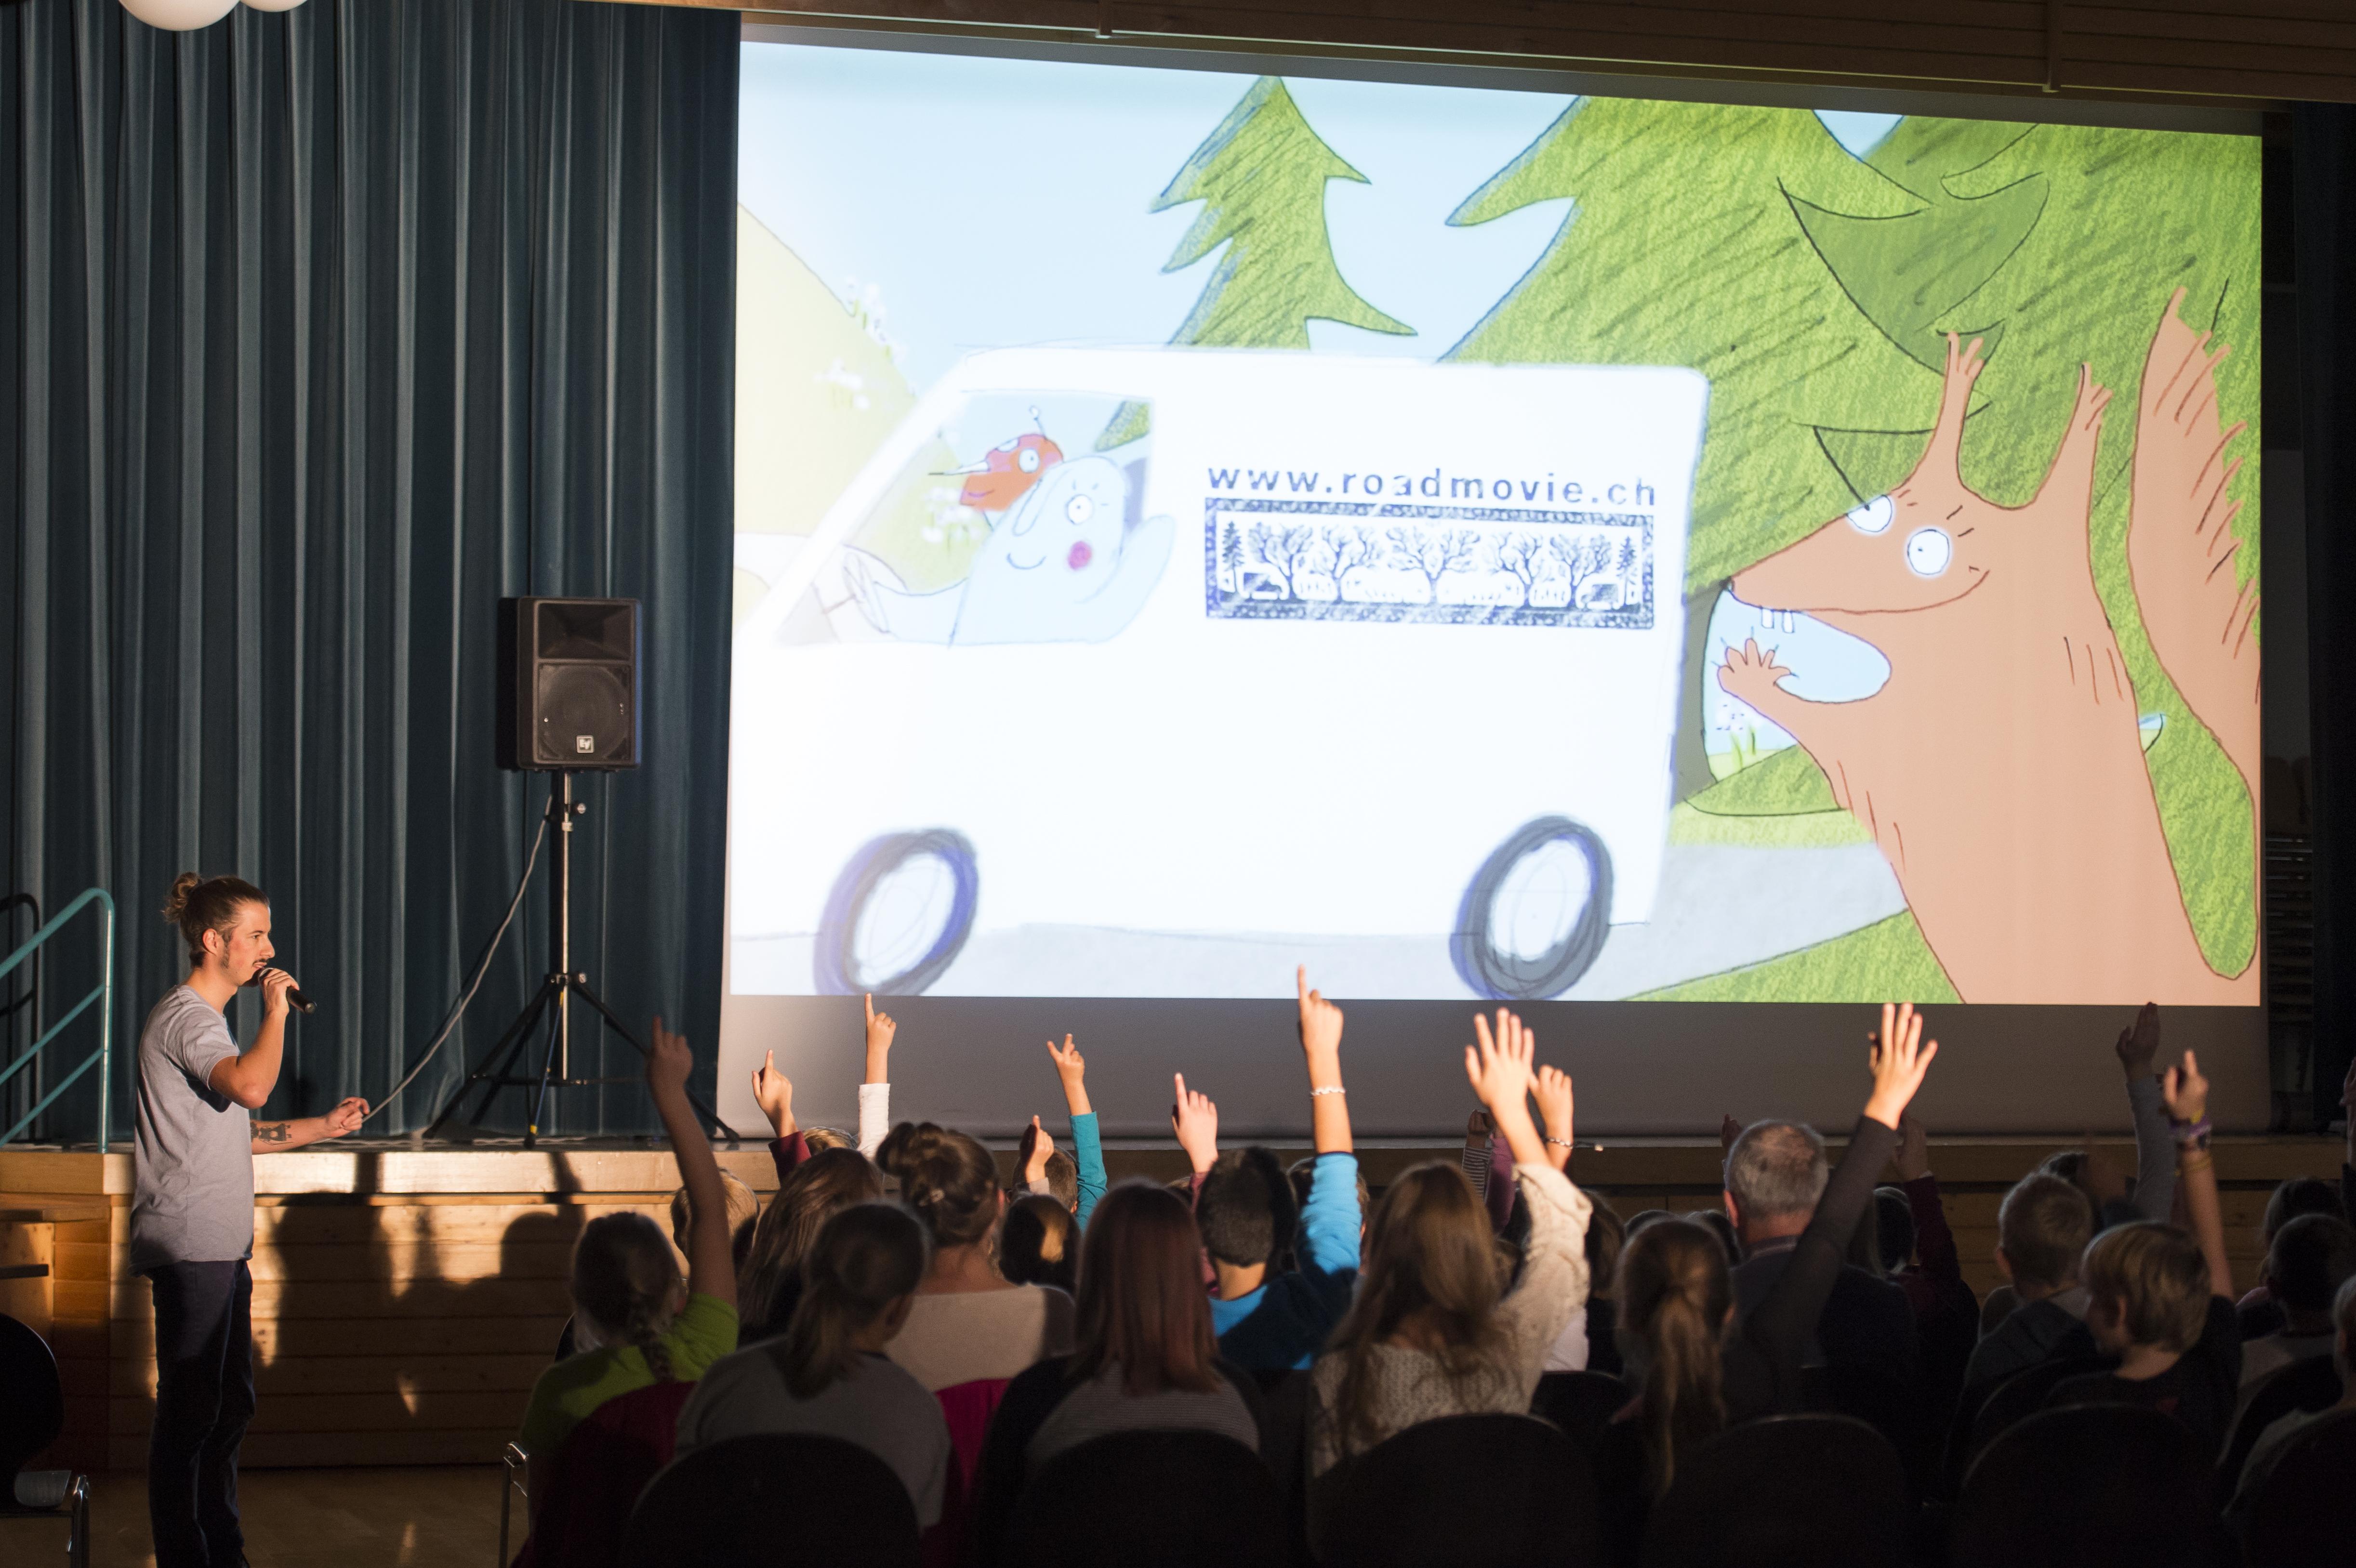 Schulprogramm in Hasliberg BE (© Roadmovie / Foto Ruedi Flück)